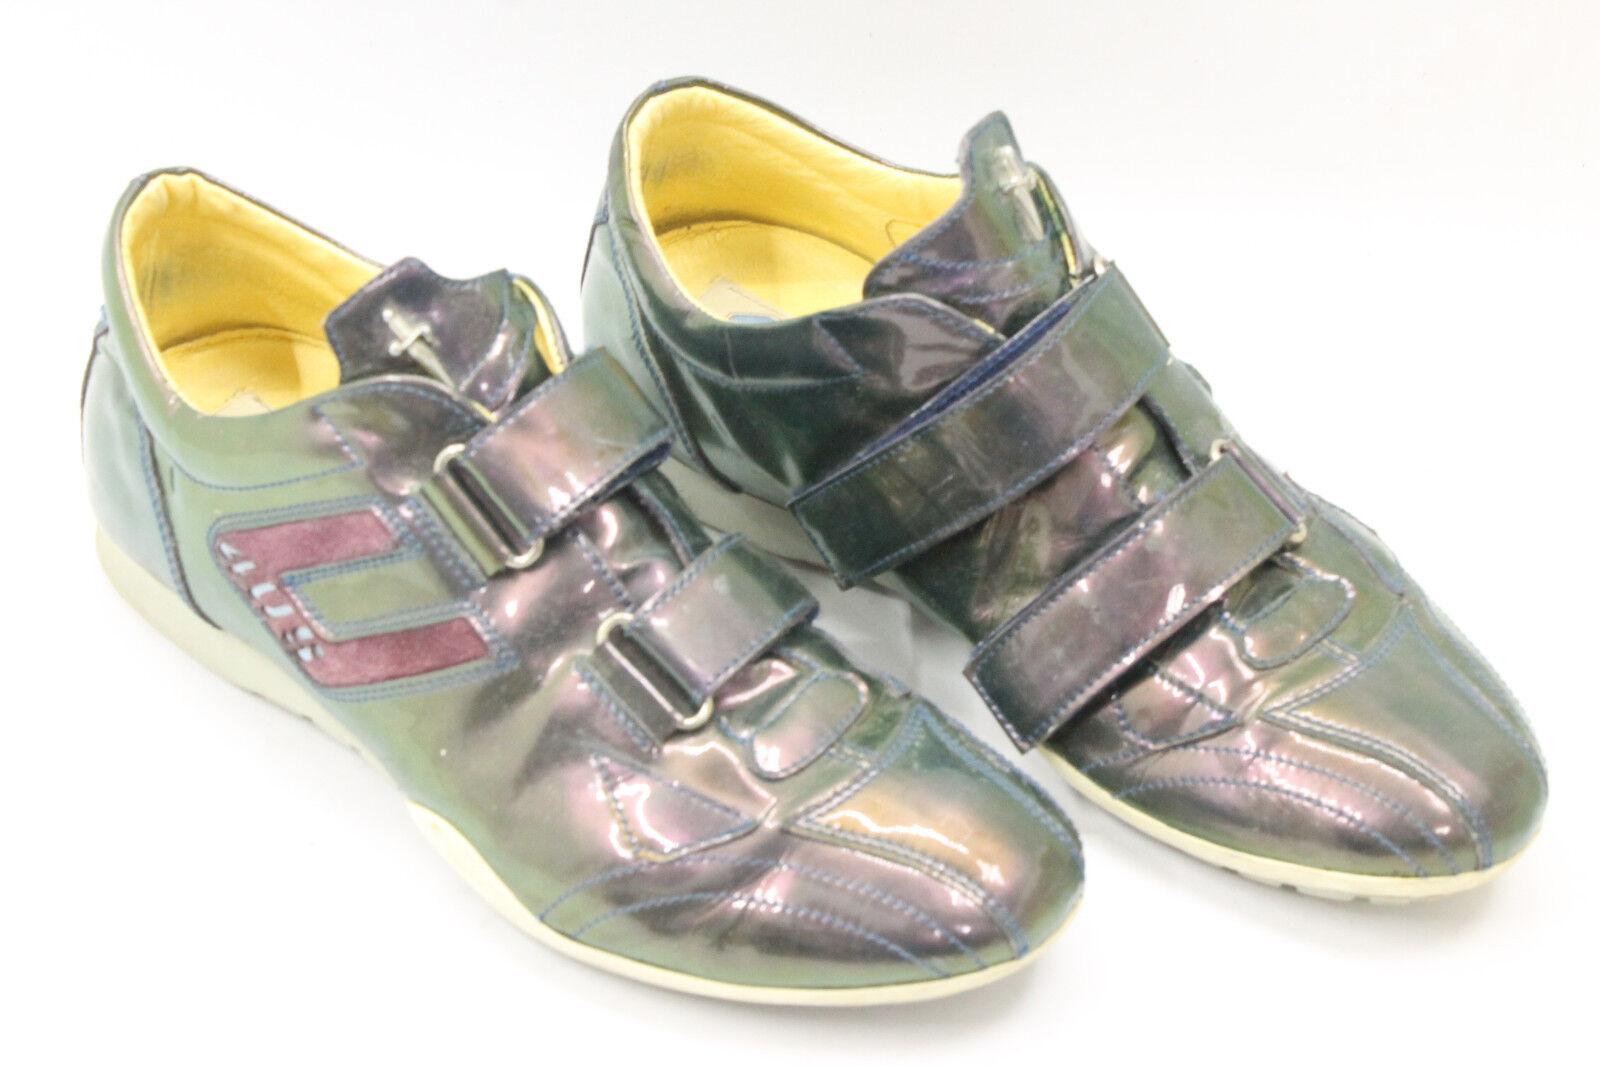 CESARE PACIOTTI women shoes sz 6.5 Europe 37 green leather S7179